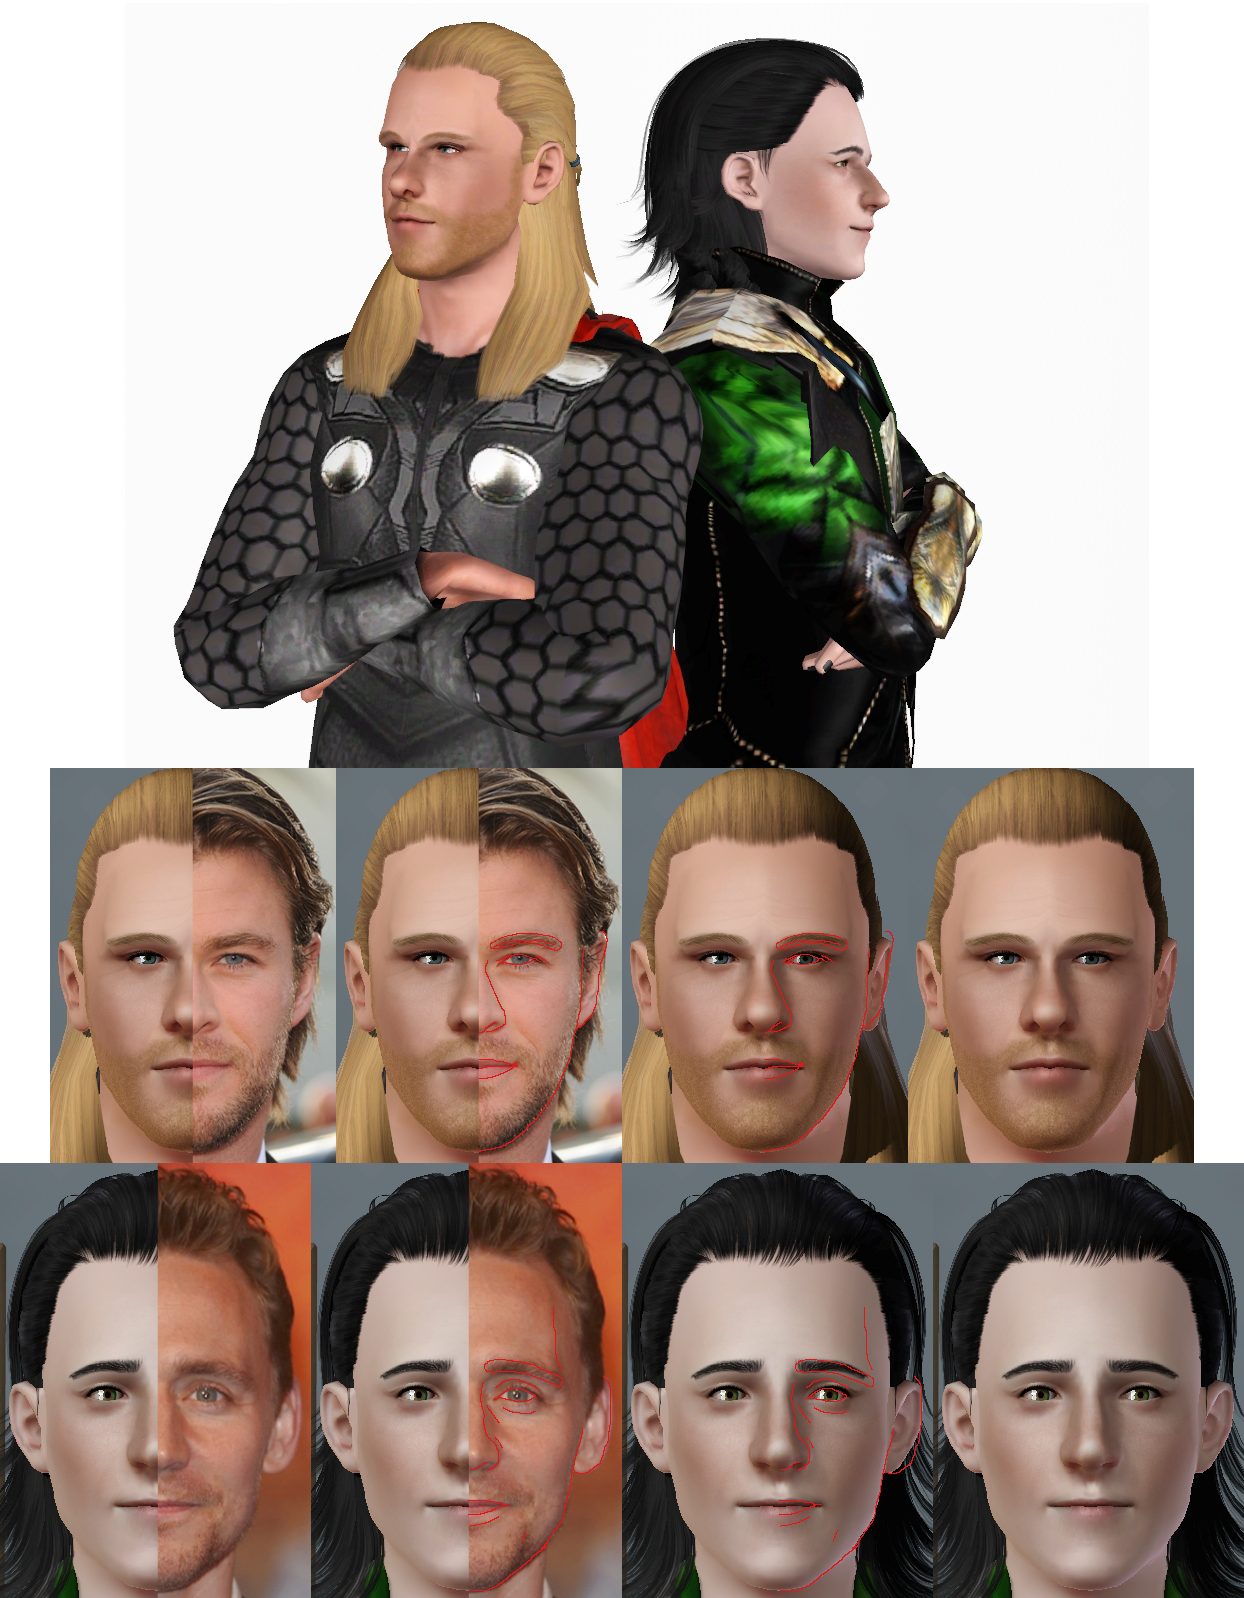 Thor Loki Sims Oneeuromutt Deviantart